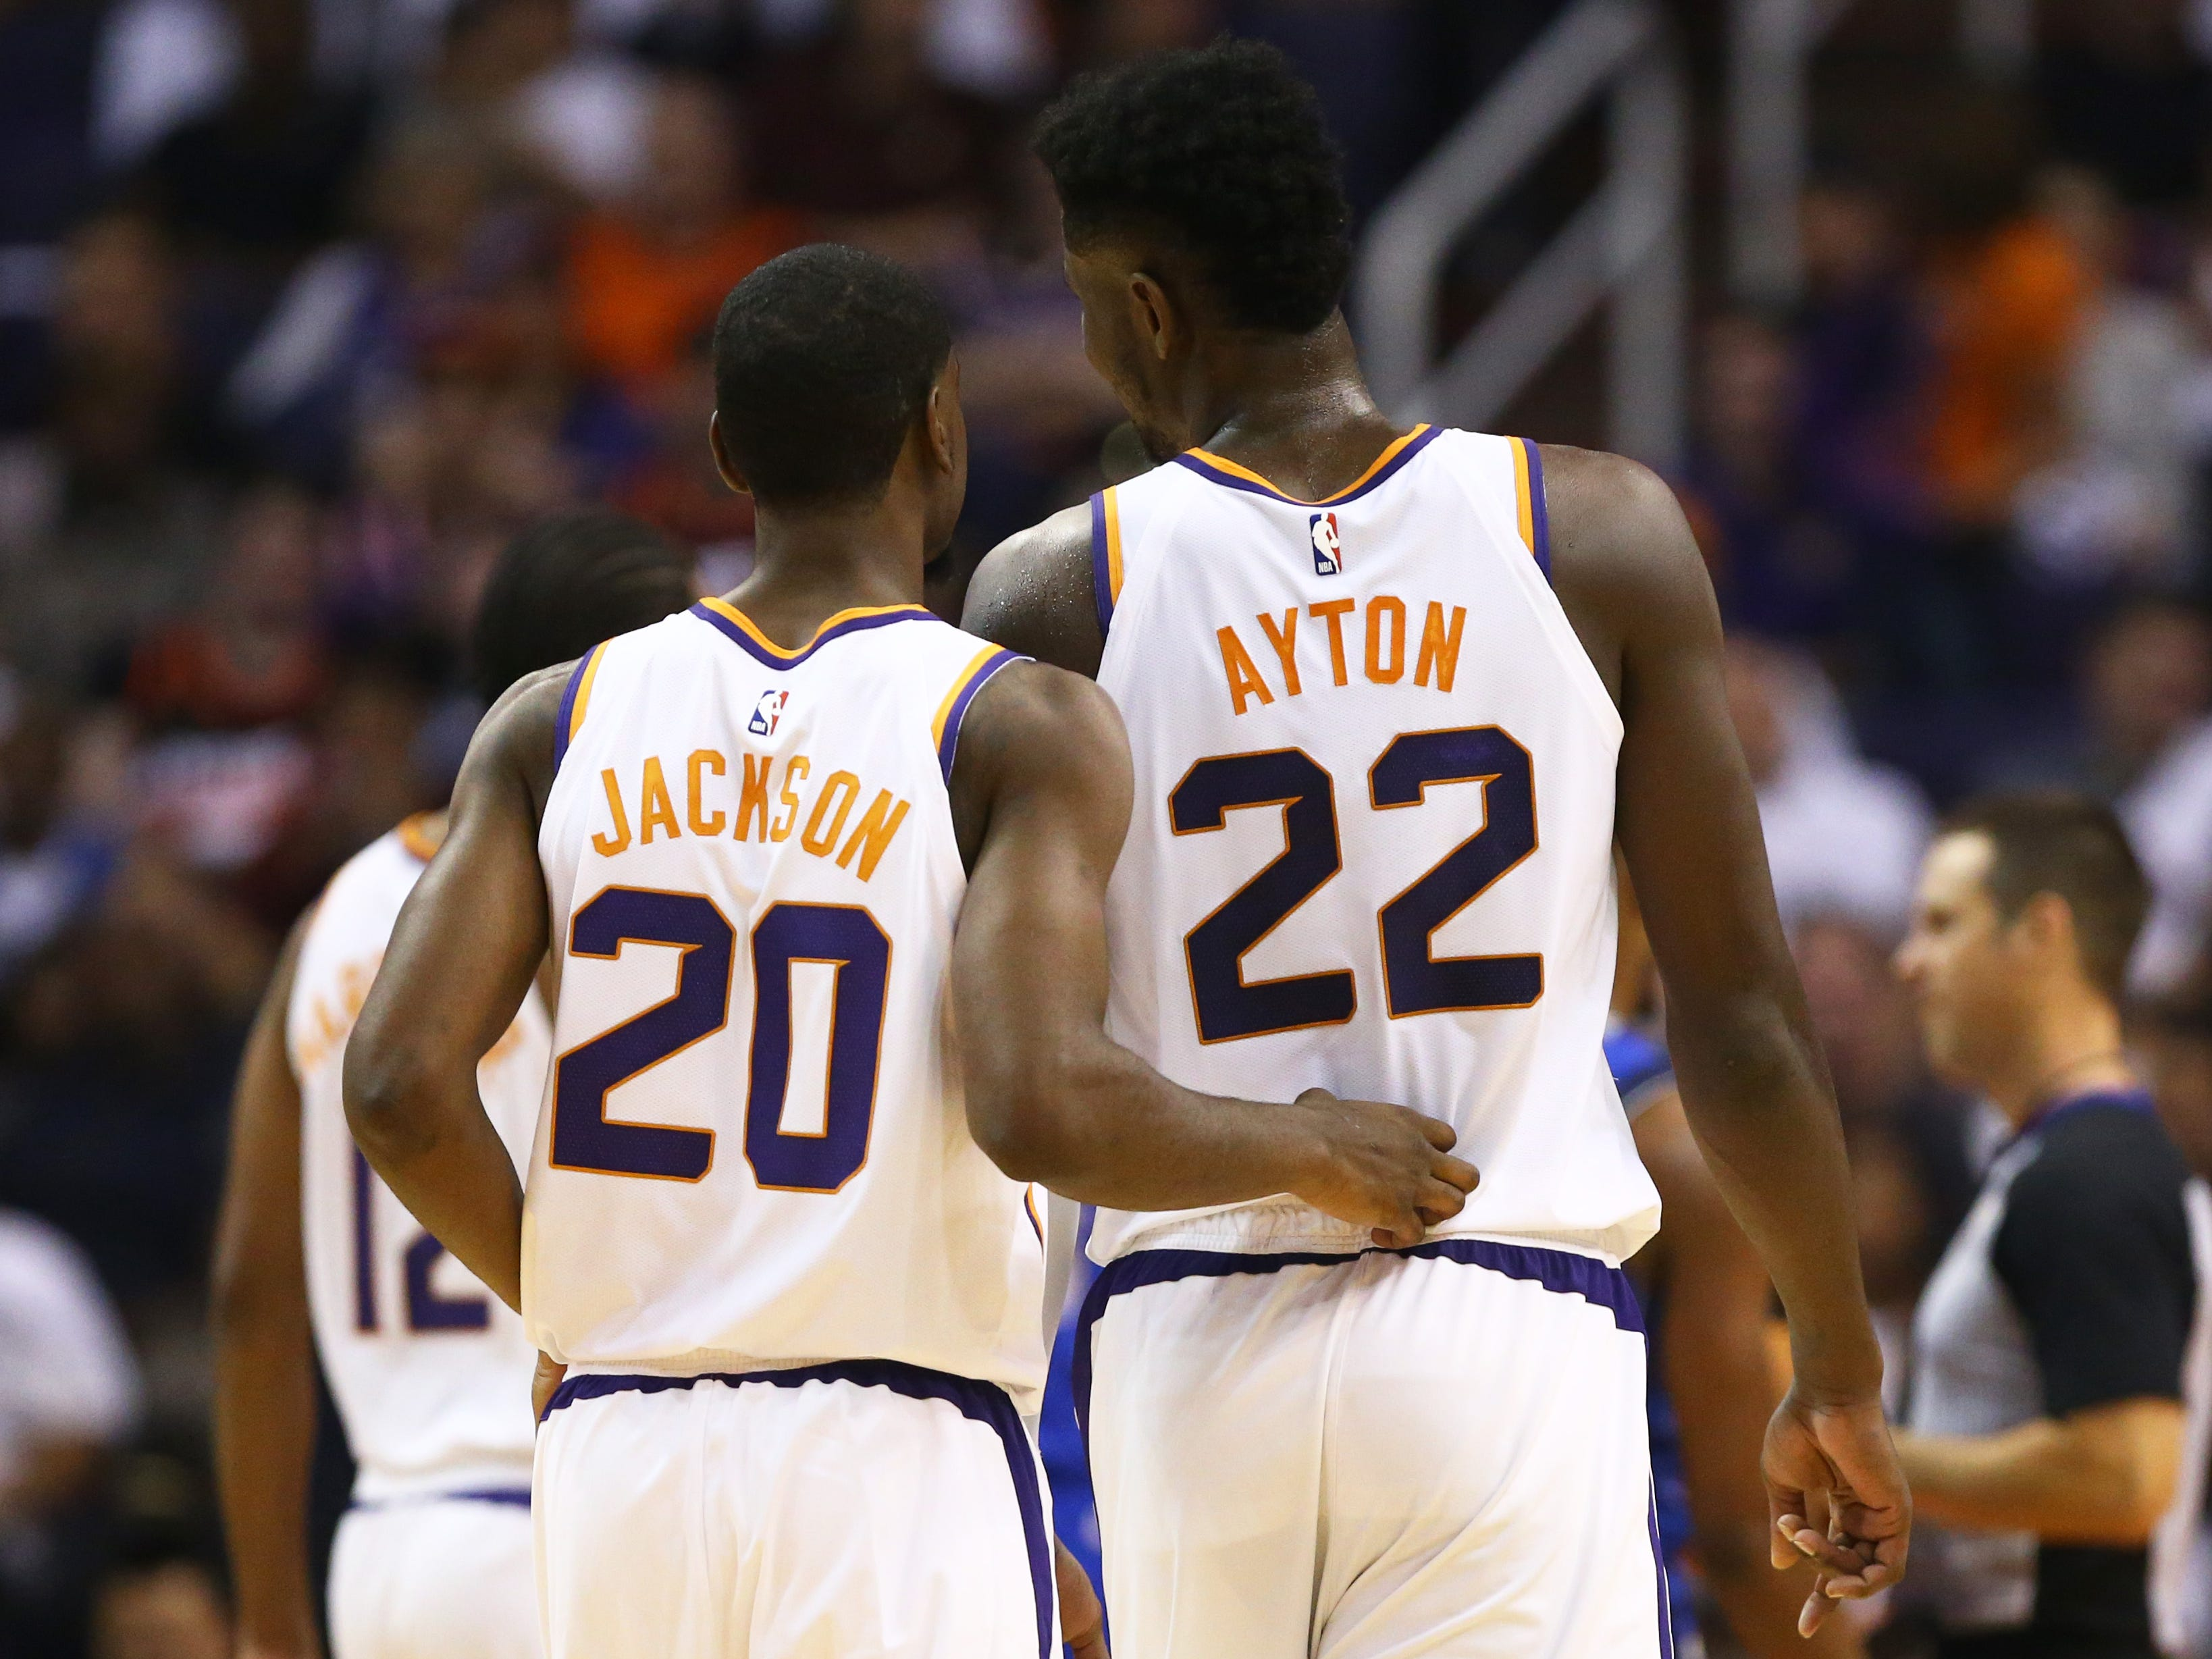 Phoenix Suns Josh Jackson and Deandre Ayton against the Dallas Mavericks during the season opener at Talking Stick Resort Arena on Oct. 17, 2018, in Phoenix, Ariz.